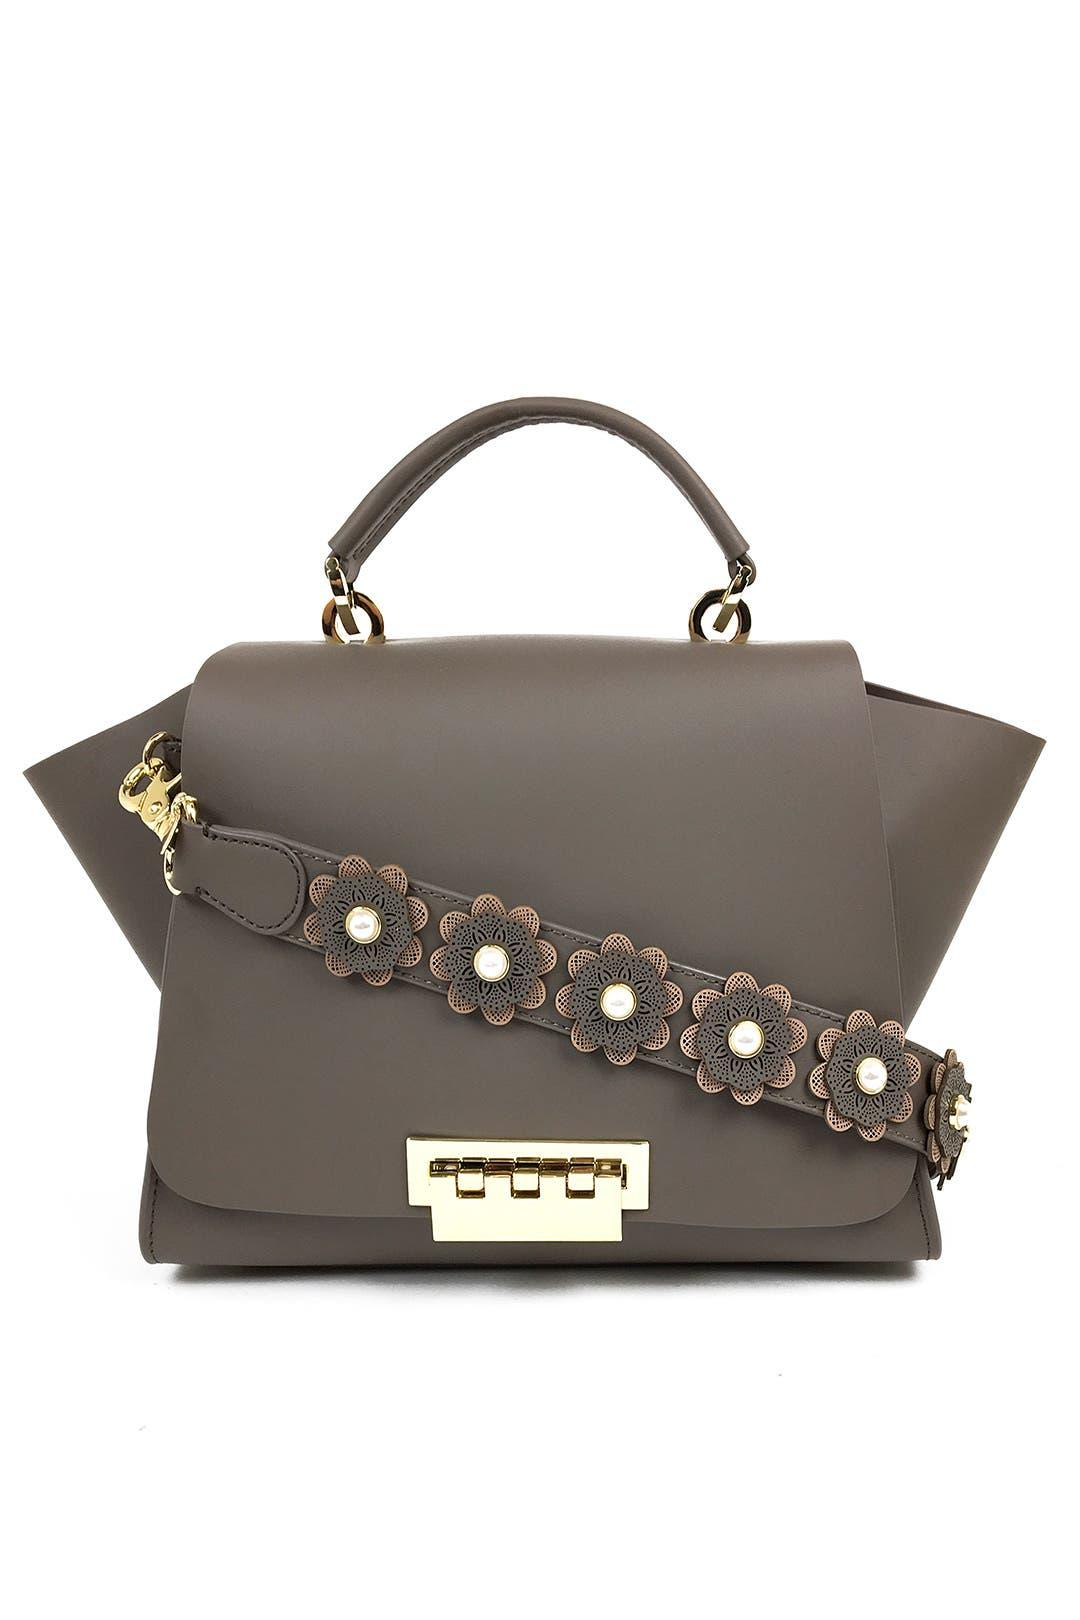 e1bfb814548e Mockingbird Eartha Bag by ZAC Zac Posen Handbags for $75 | Rent the ...